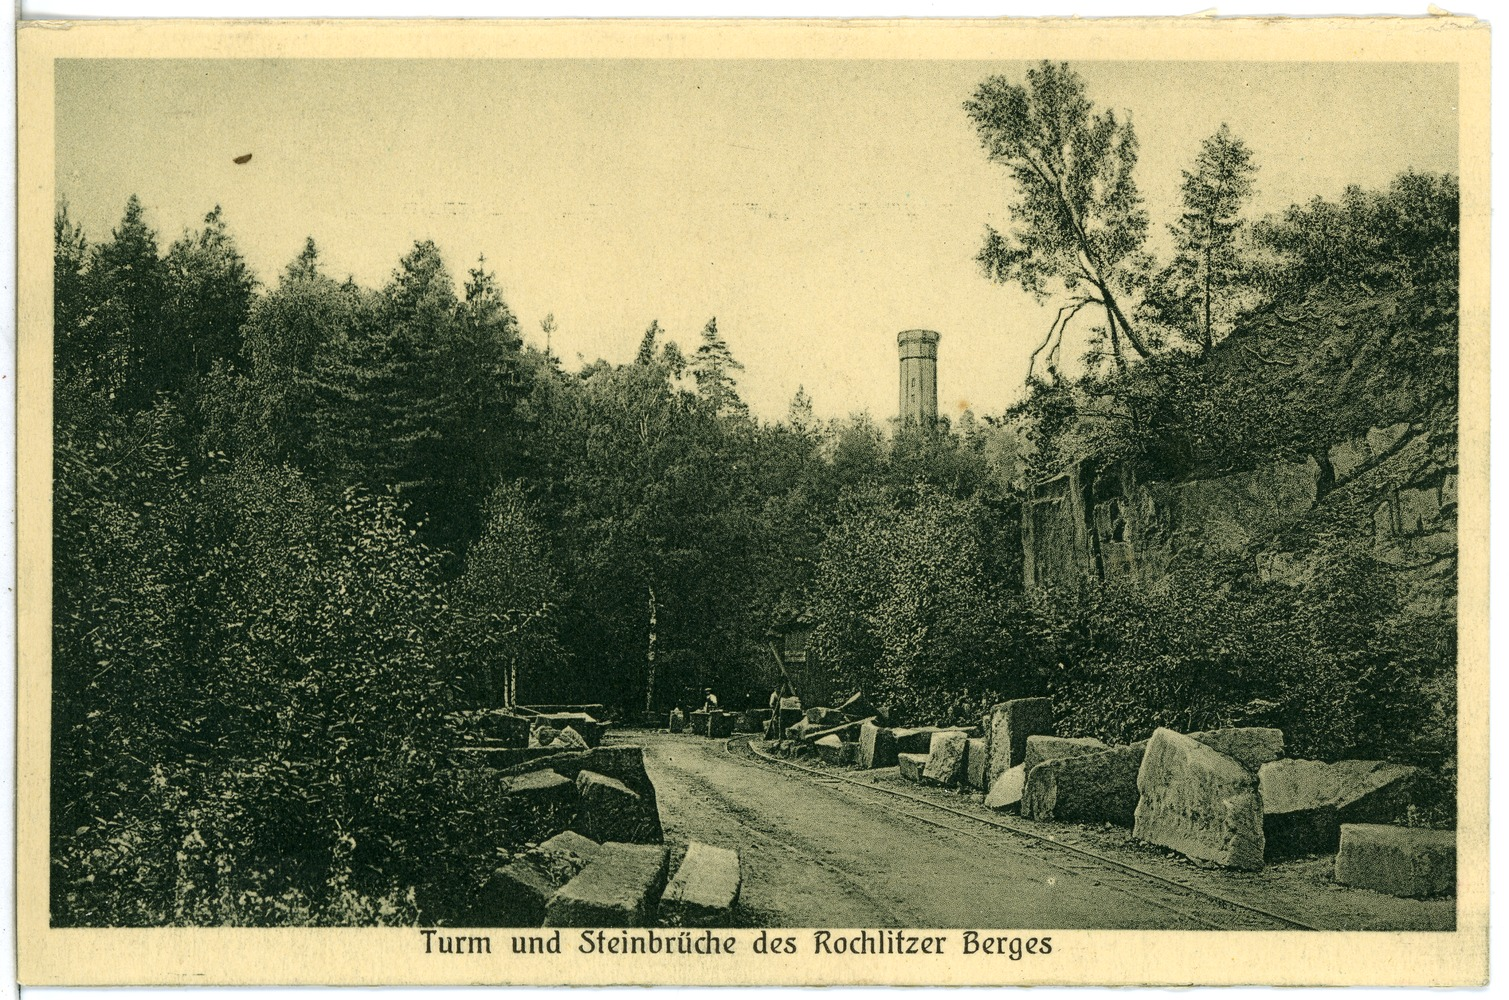 File:23848 Rochlitz 1927 Steinbrüche Des Rochlitzer Berges Brück U0026 Sohn